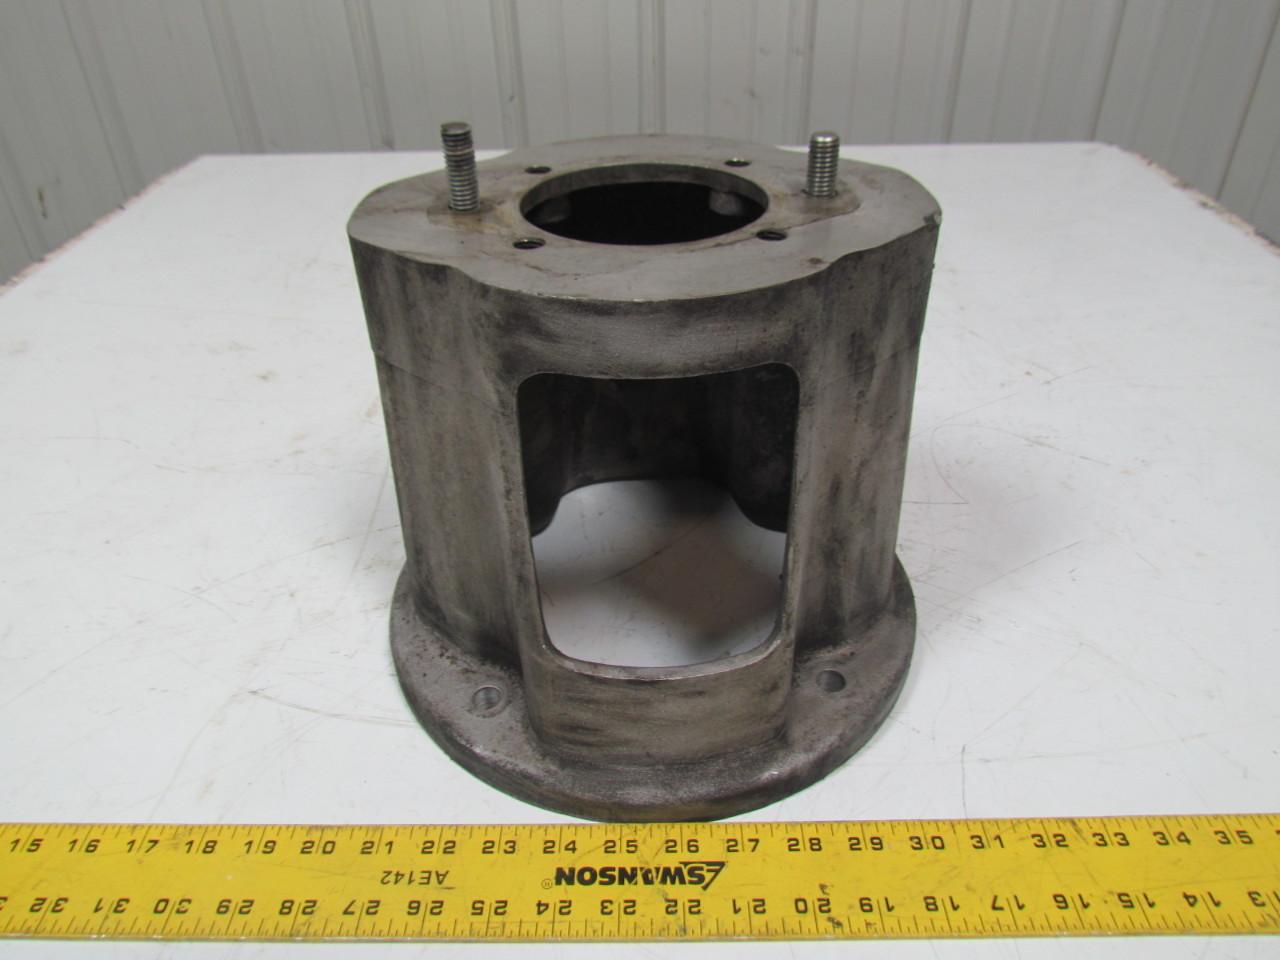 Macmillin hydraulic f3l 286tc motor adapter 4 bolt flange for Hydraulic pump motor adapter